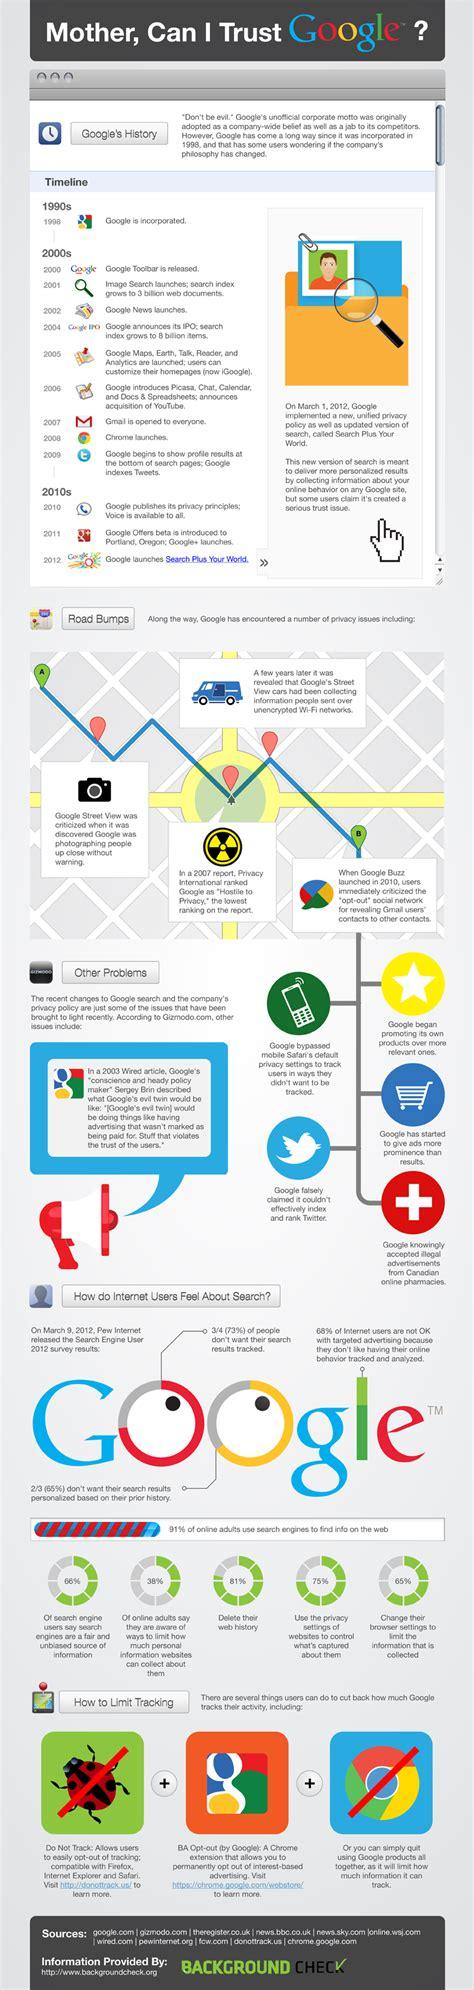 google images infographic google timeline can we still trust google infographic